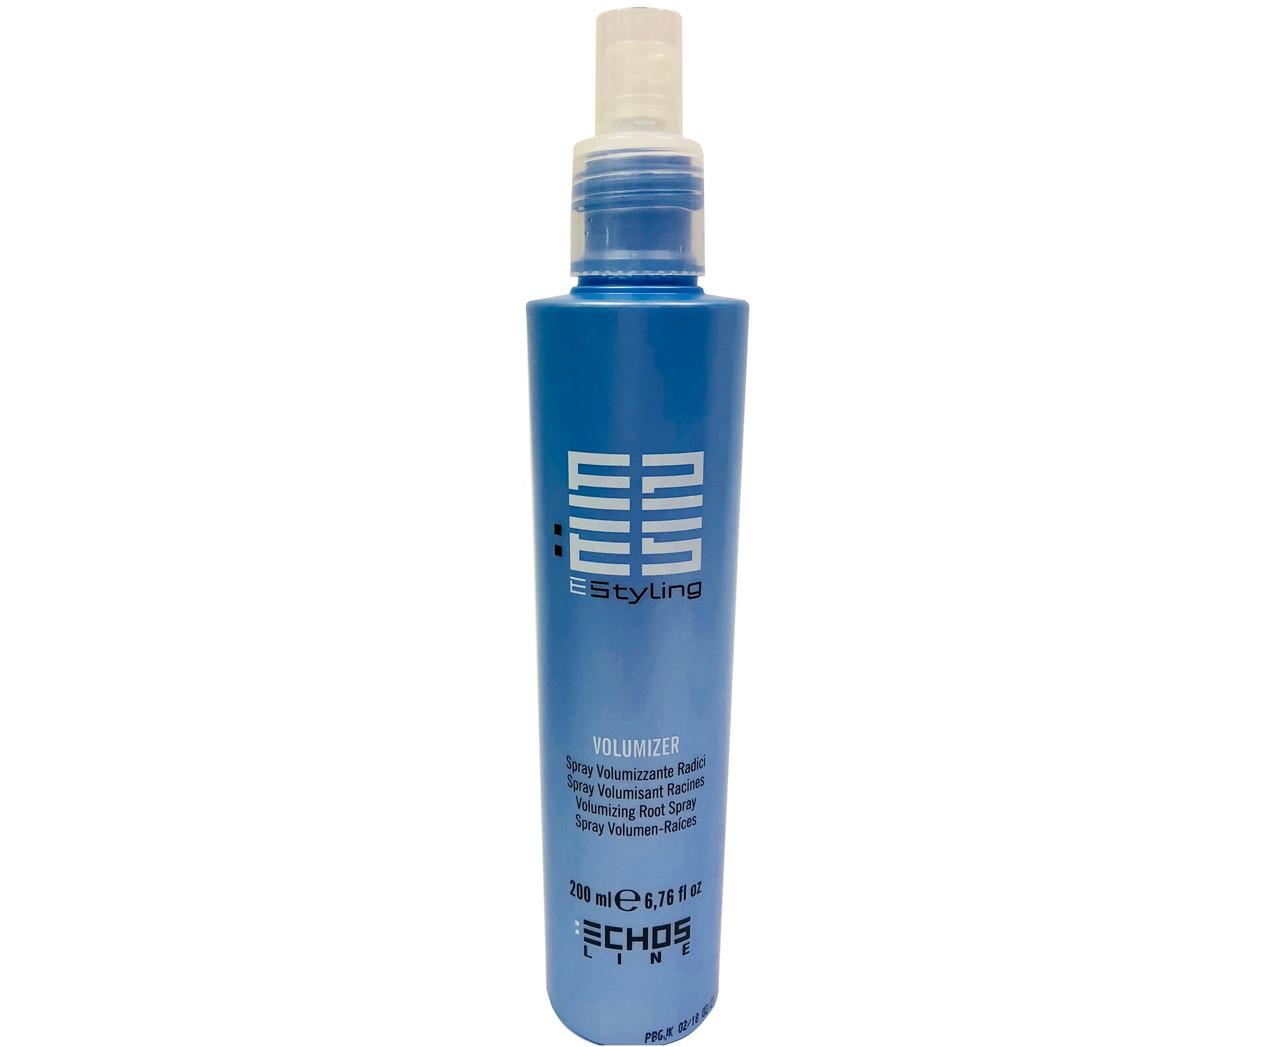 Спрей прикорневой для волос ECHOSLINE STYLING VOLUMIZER SPRAY, 200 МЛ